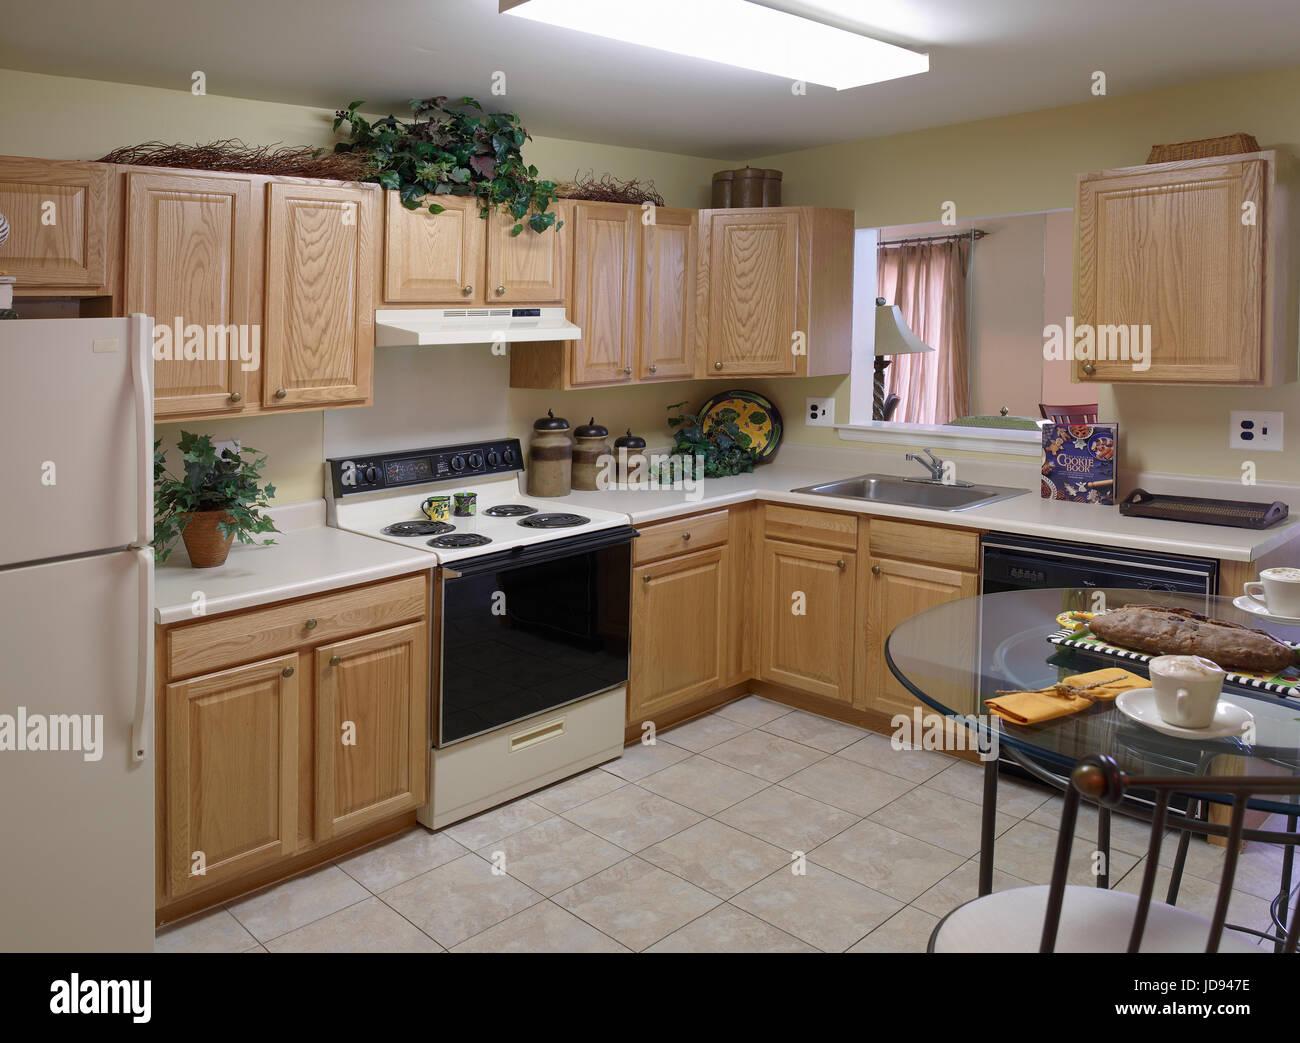 Küche Interieur Stockbild